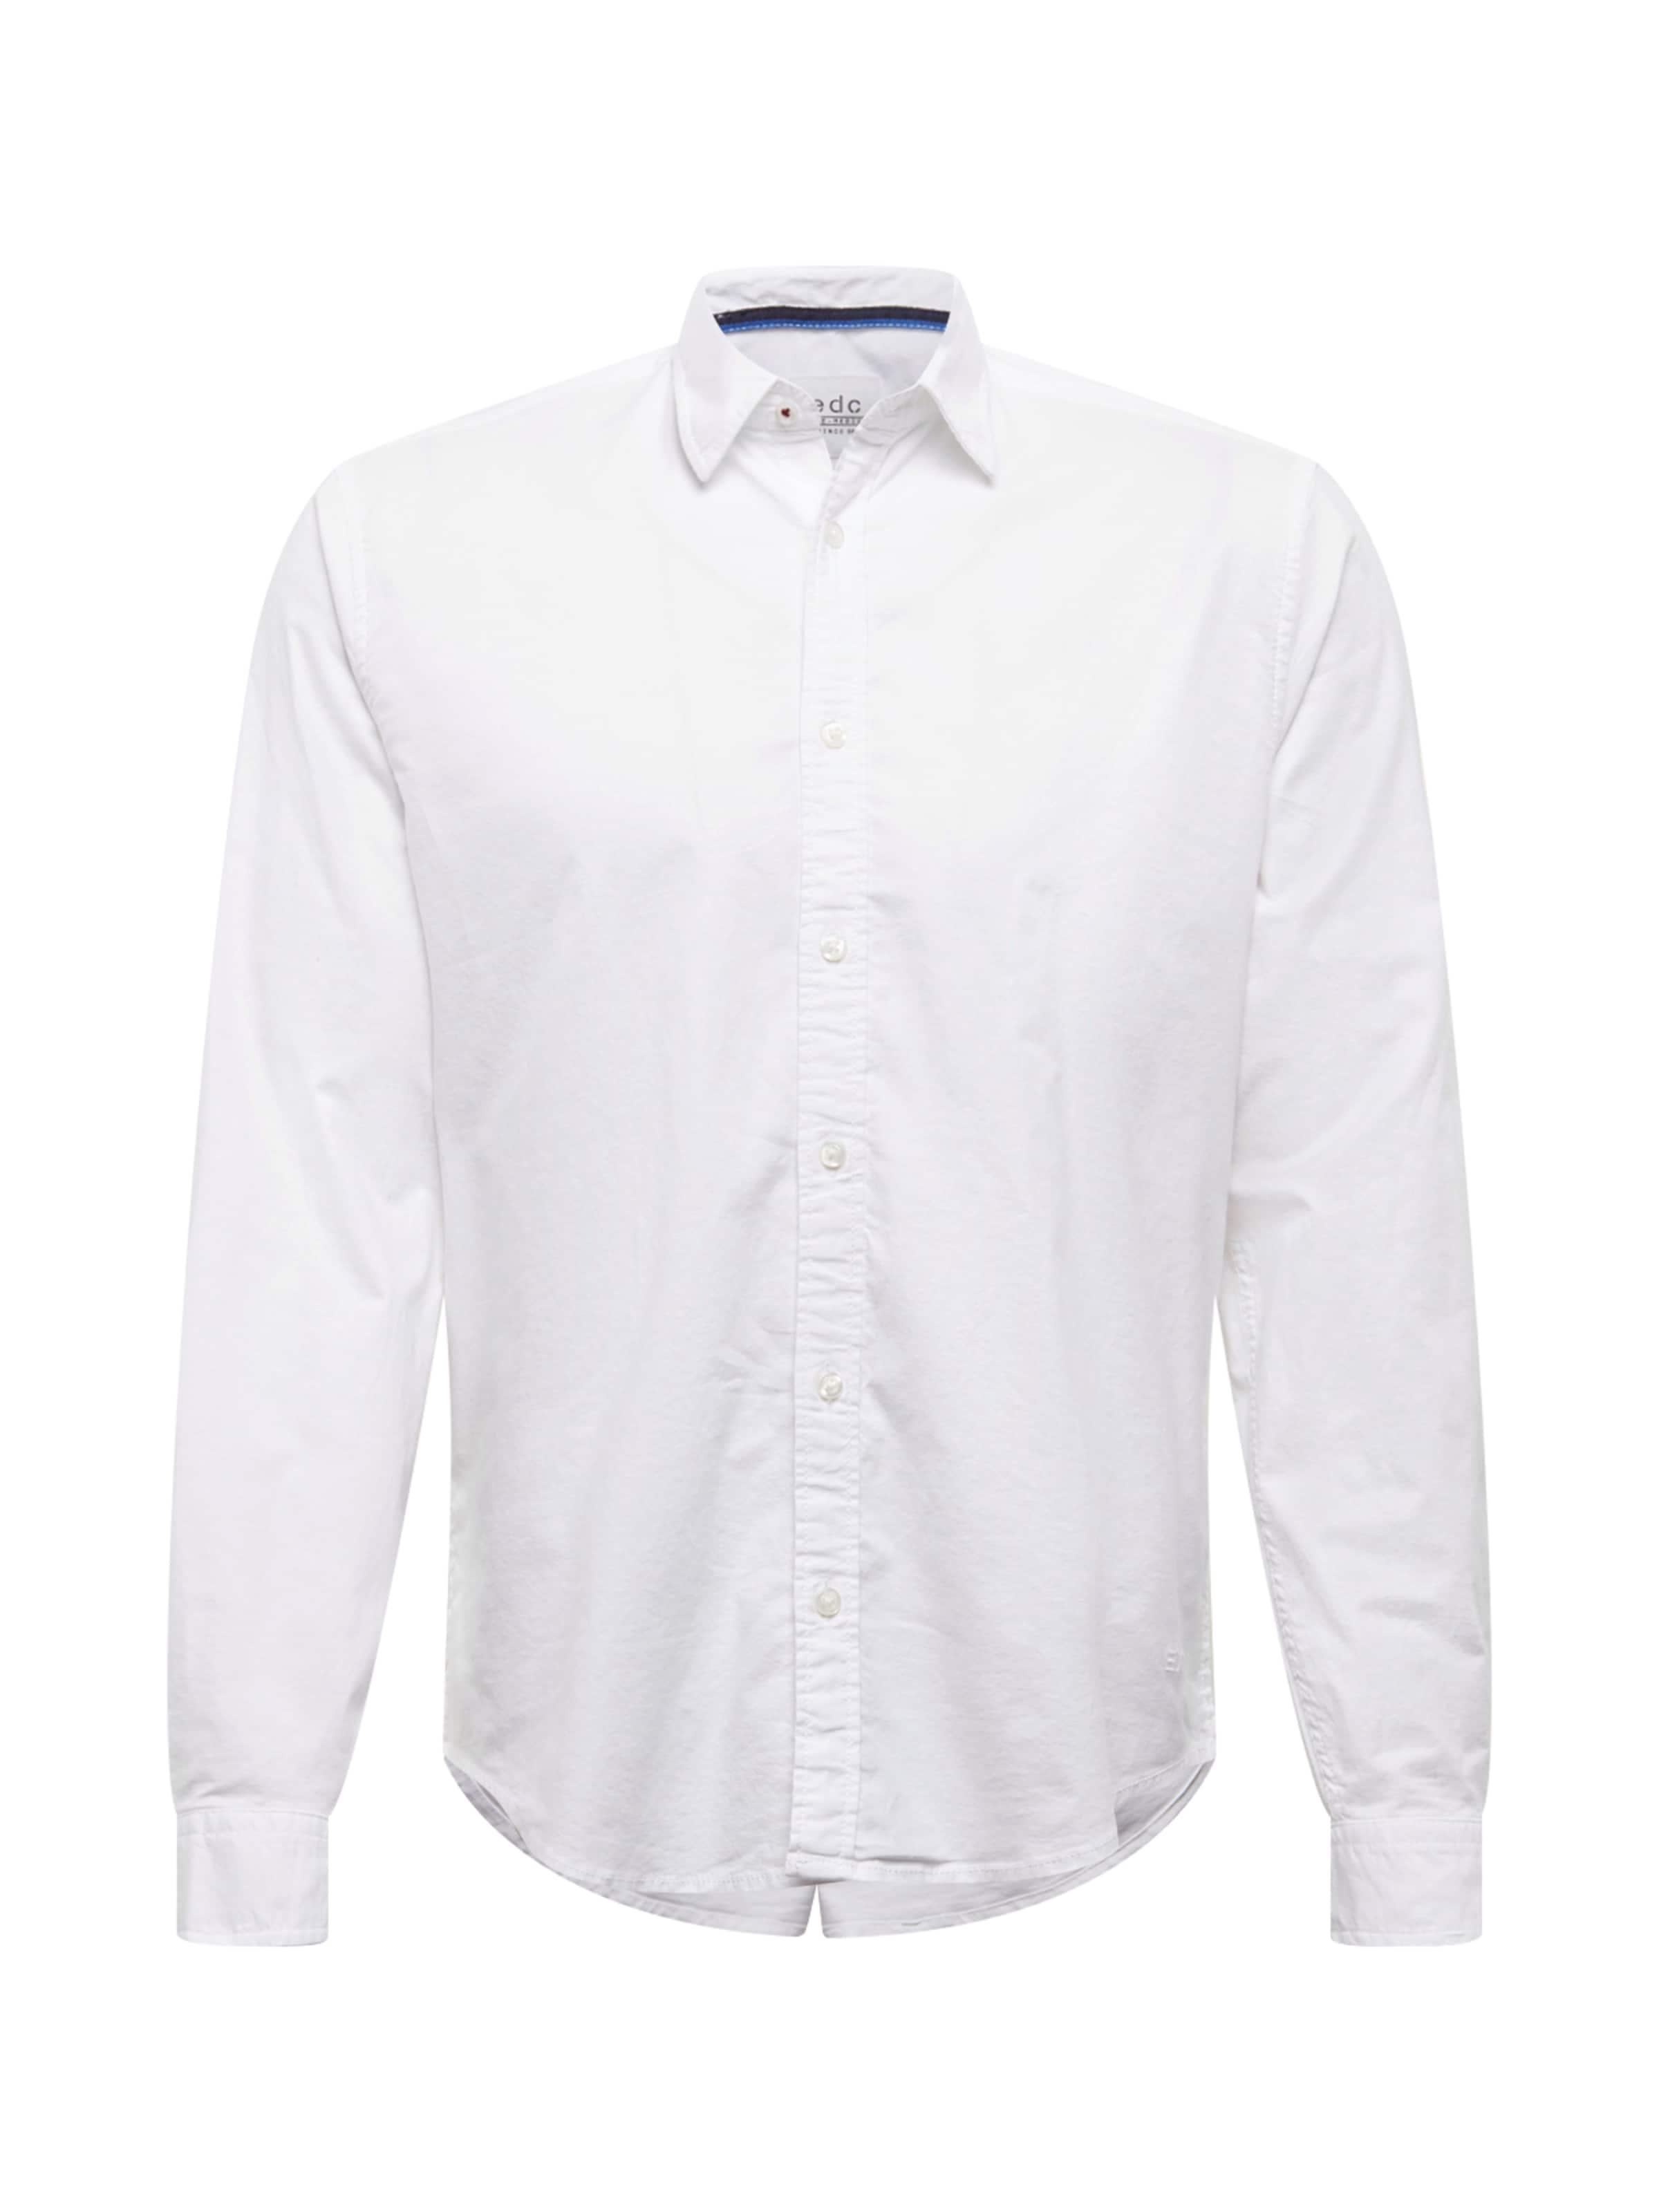 Blanc Solid Esprit Business ' By Chemise Edc En 'f Oxfd 35A4LRj